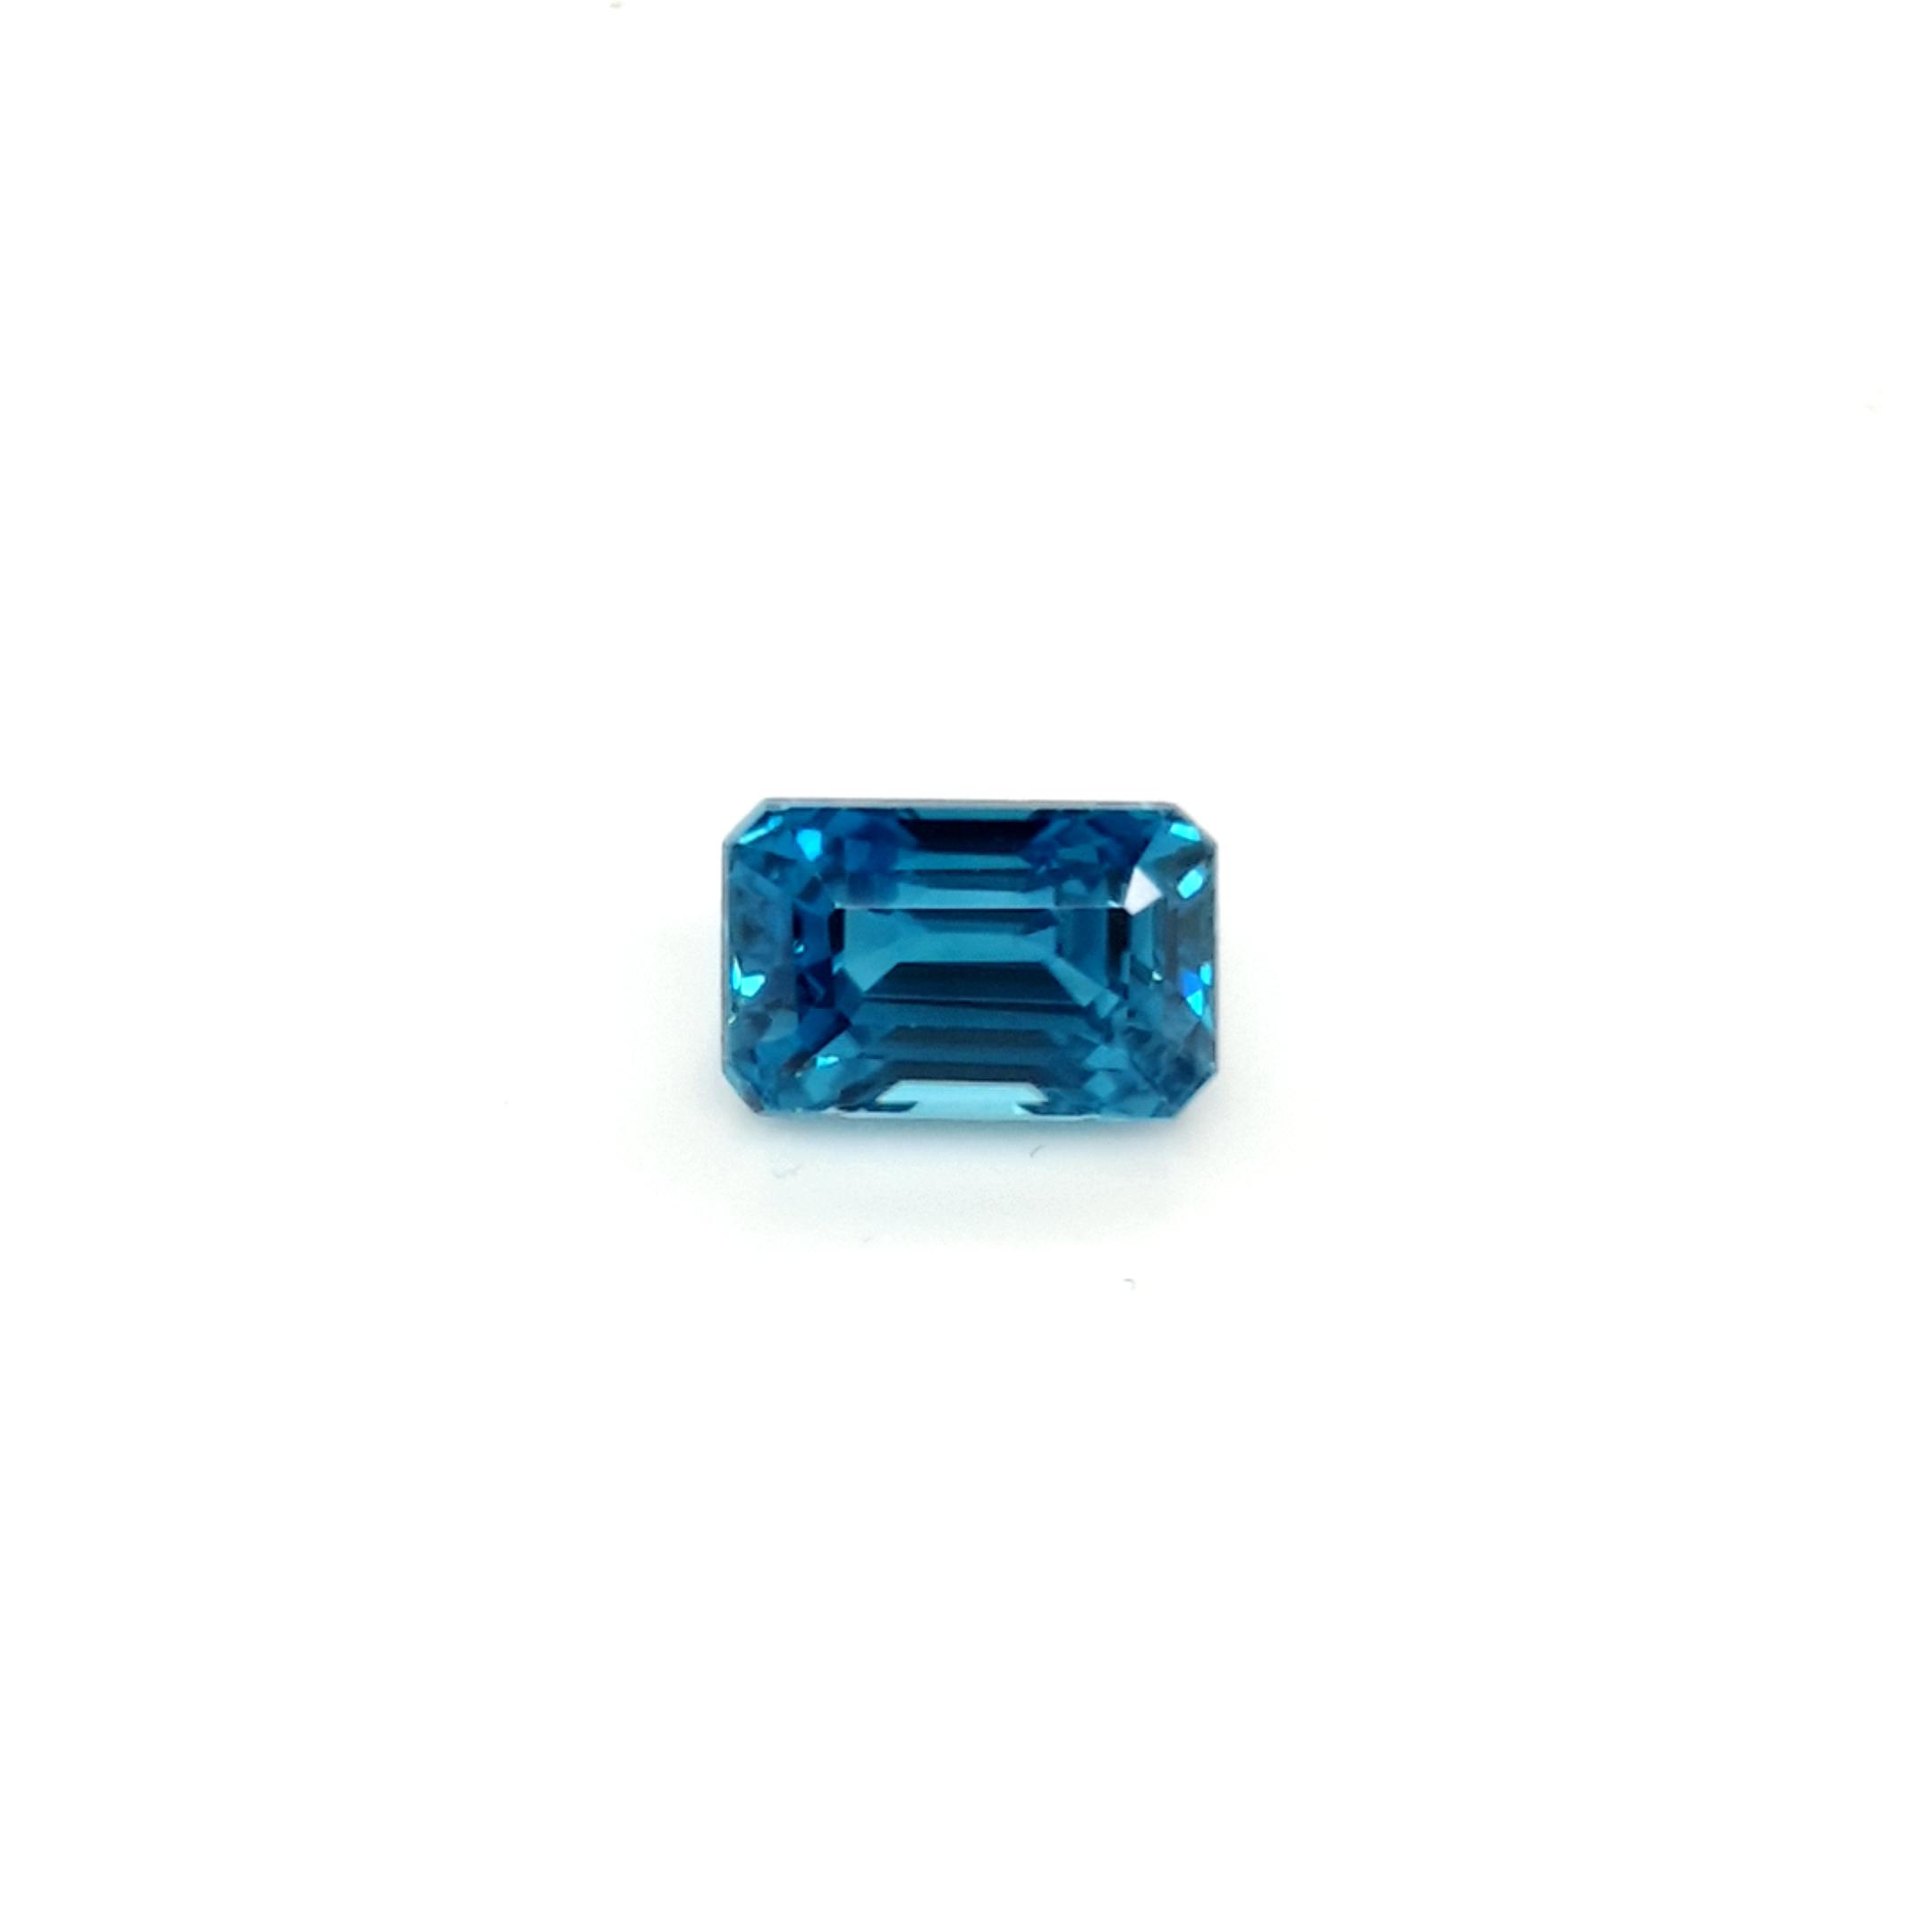 5,30ct. Octagone Starlight Blue Zircon ZCF18D6 ClaudiaHamann__2021-04-15-11-54-16